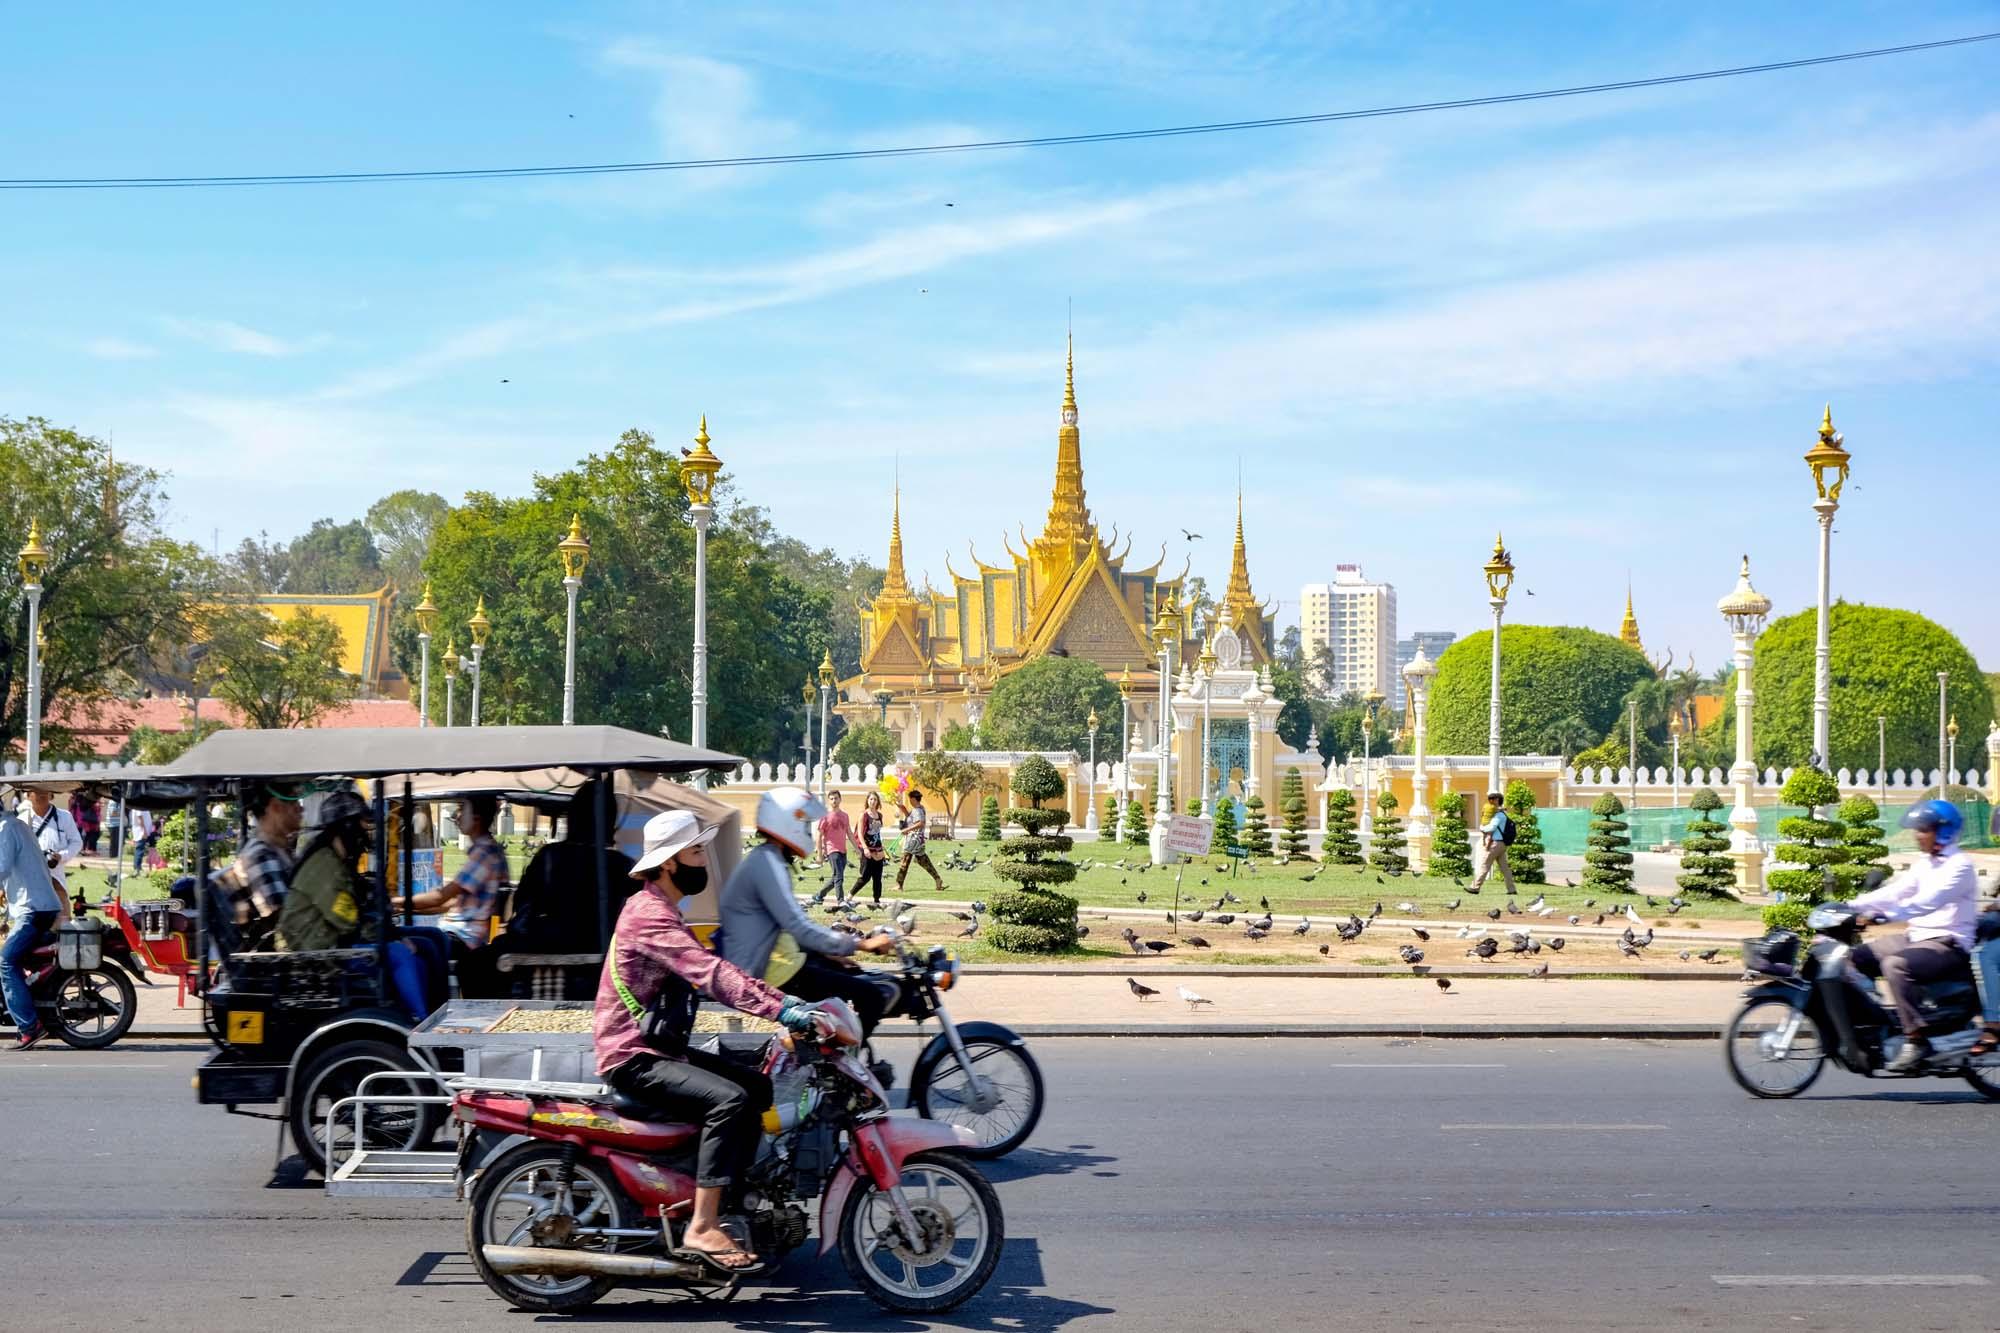 streets of phnom penh